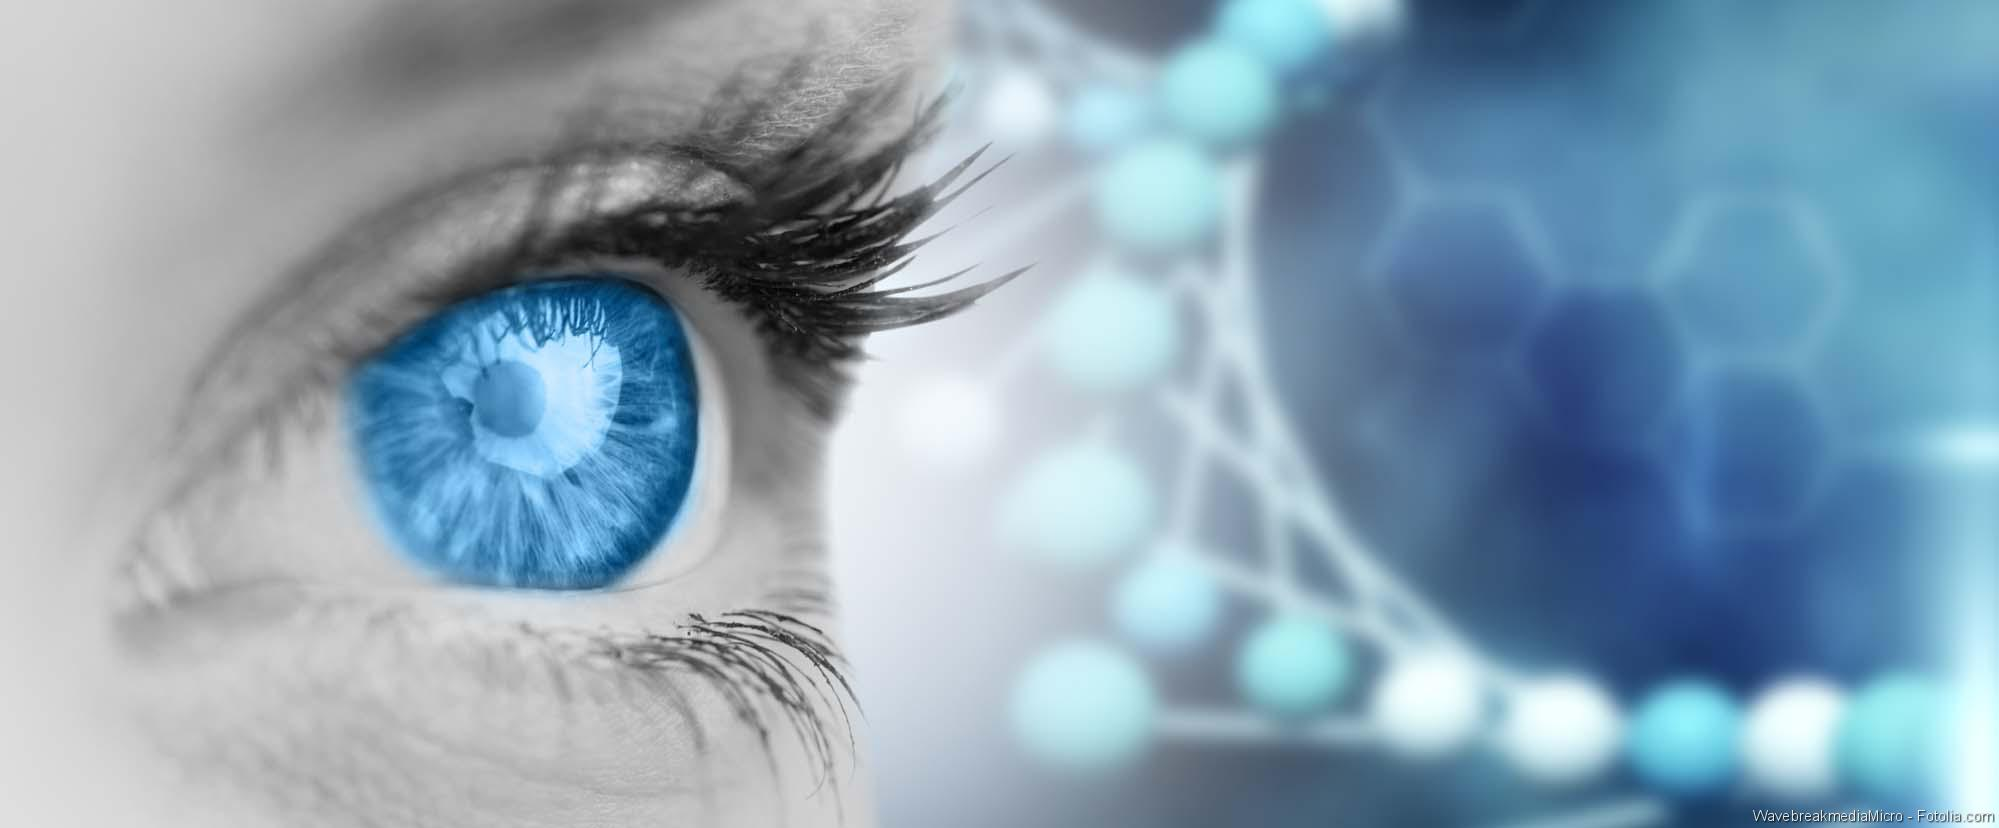 Altersbedingte Makuladegeneration, Netzhautdegeneration, Laserkorrekturen, Augenerkrankungen, Blendschutz, Bildschirmarbeit